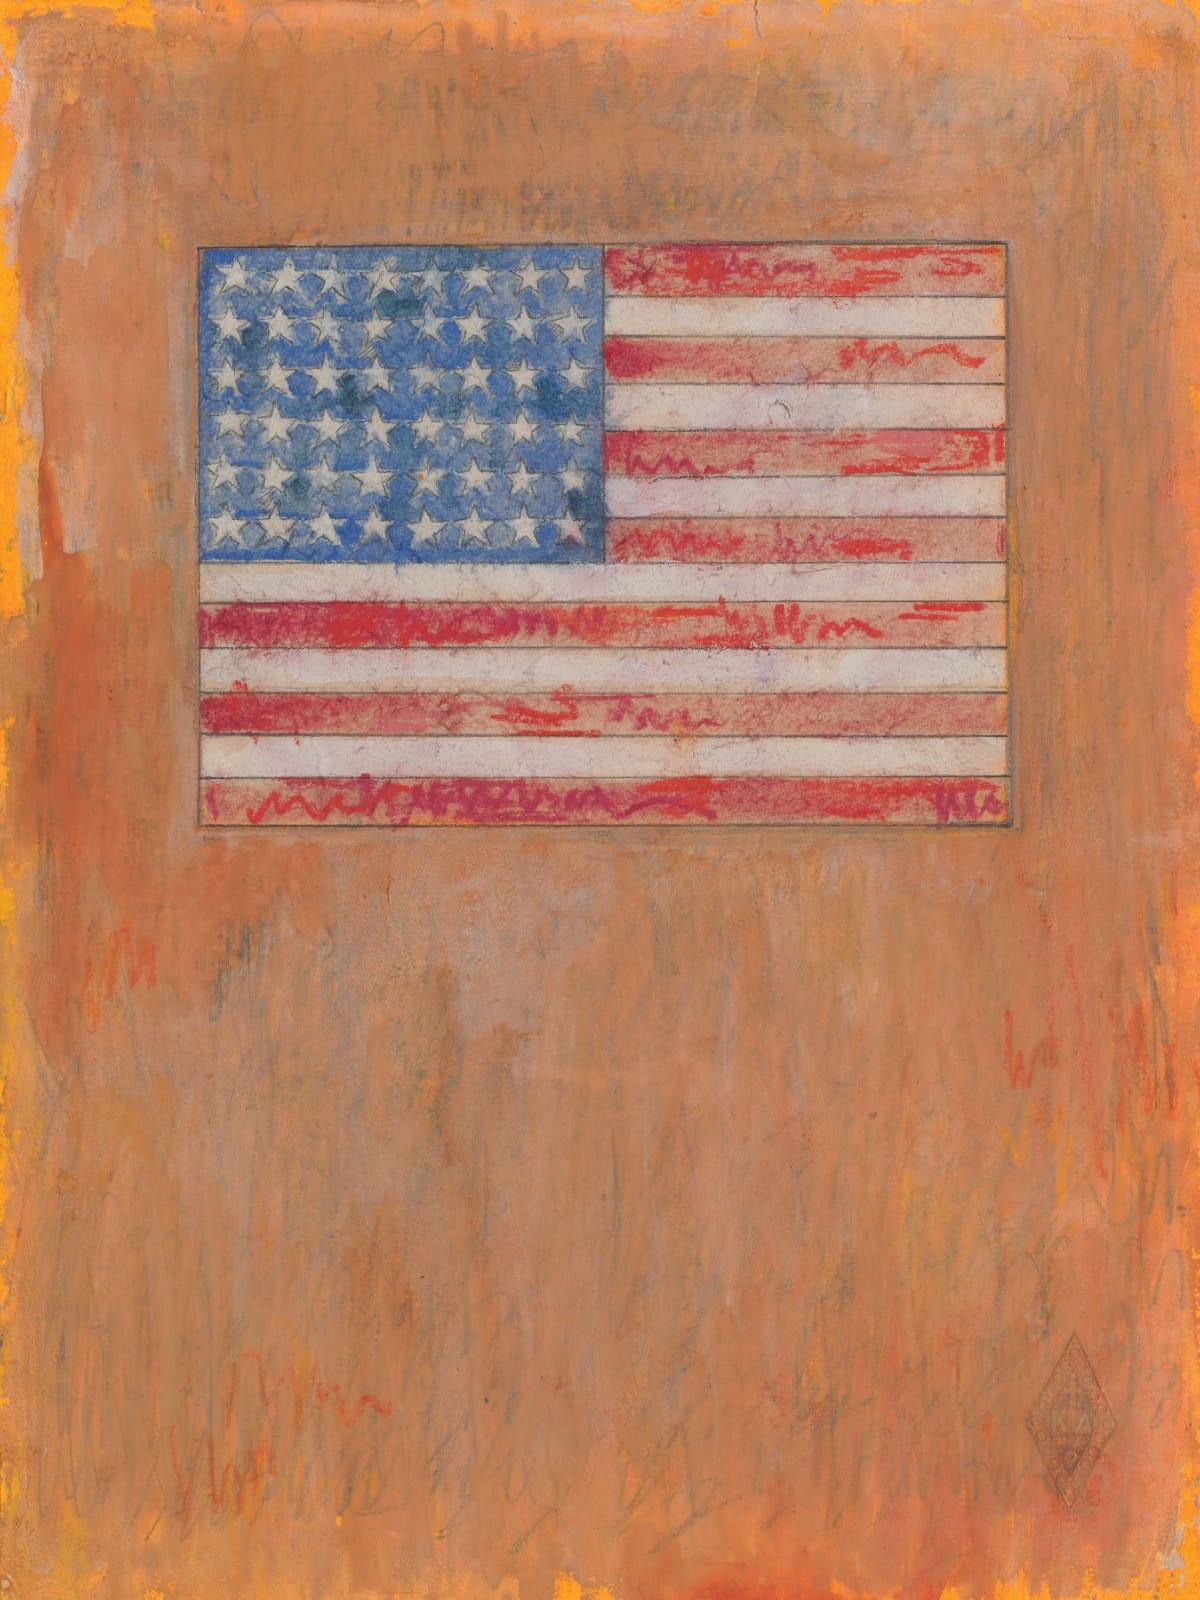 Jasper Johns, Flag on an Orange Field drawing